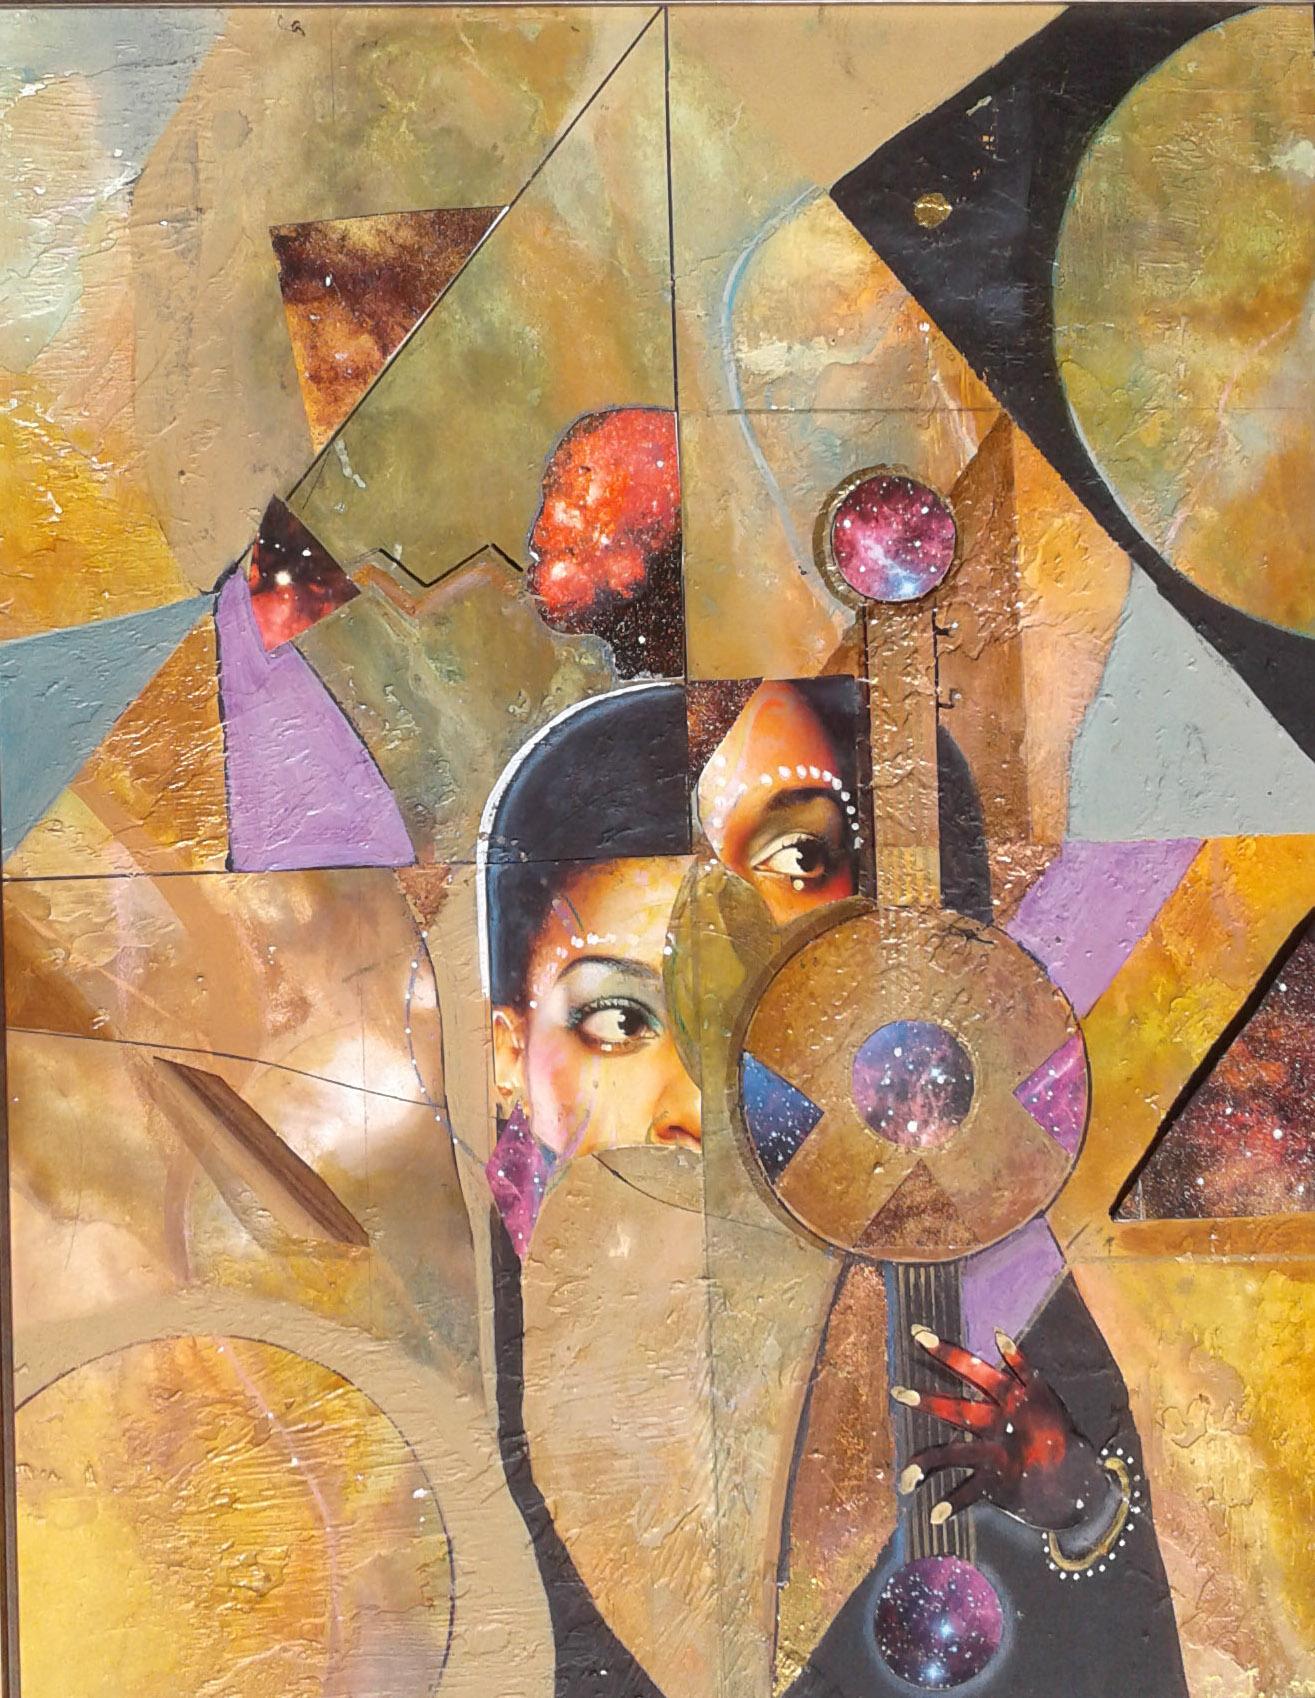 Art by David Lawrence